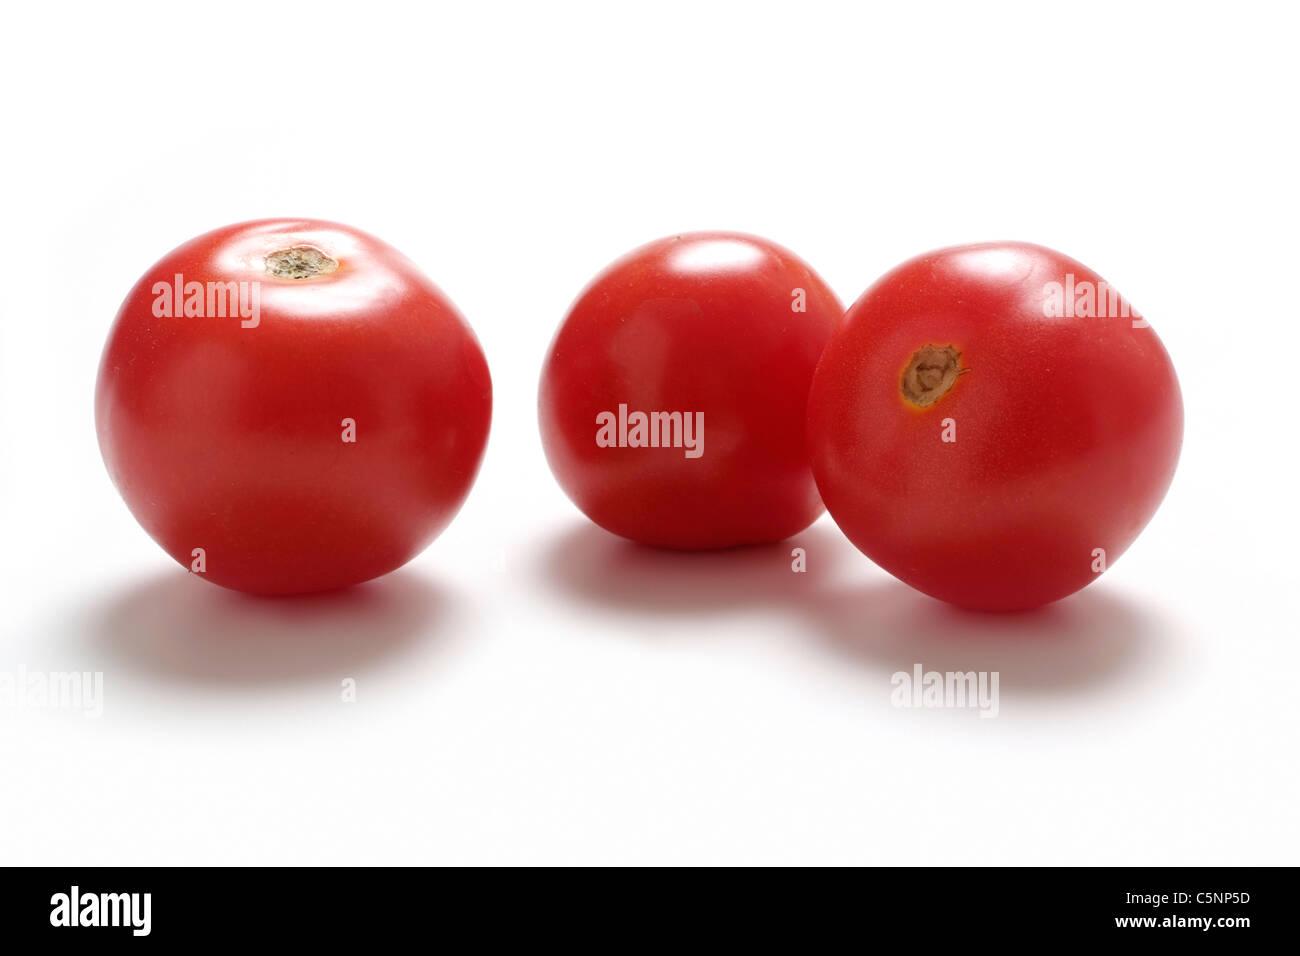 Tomato varieties: Wladiwostock - Stock Image